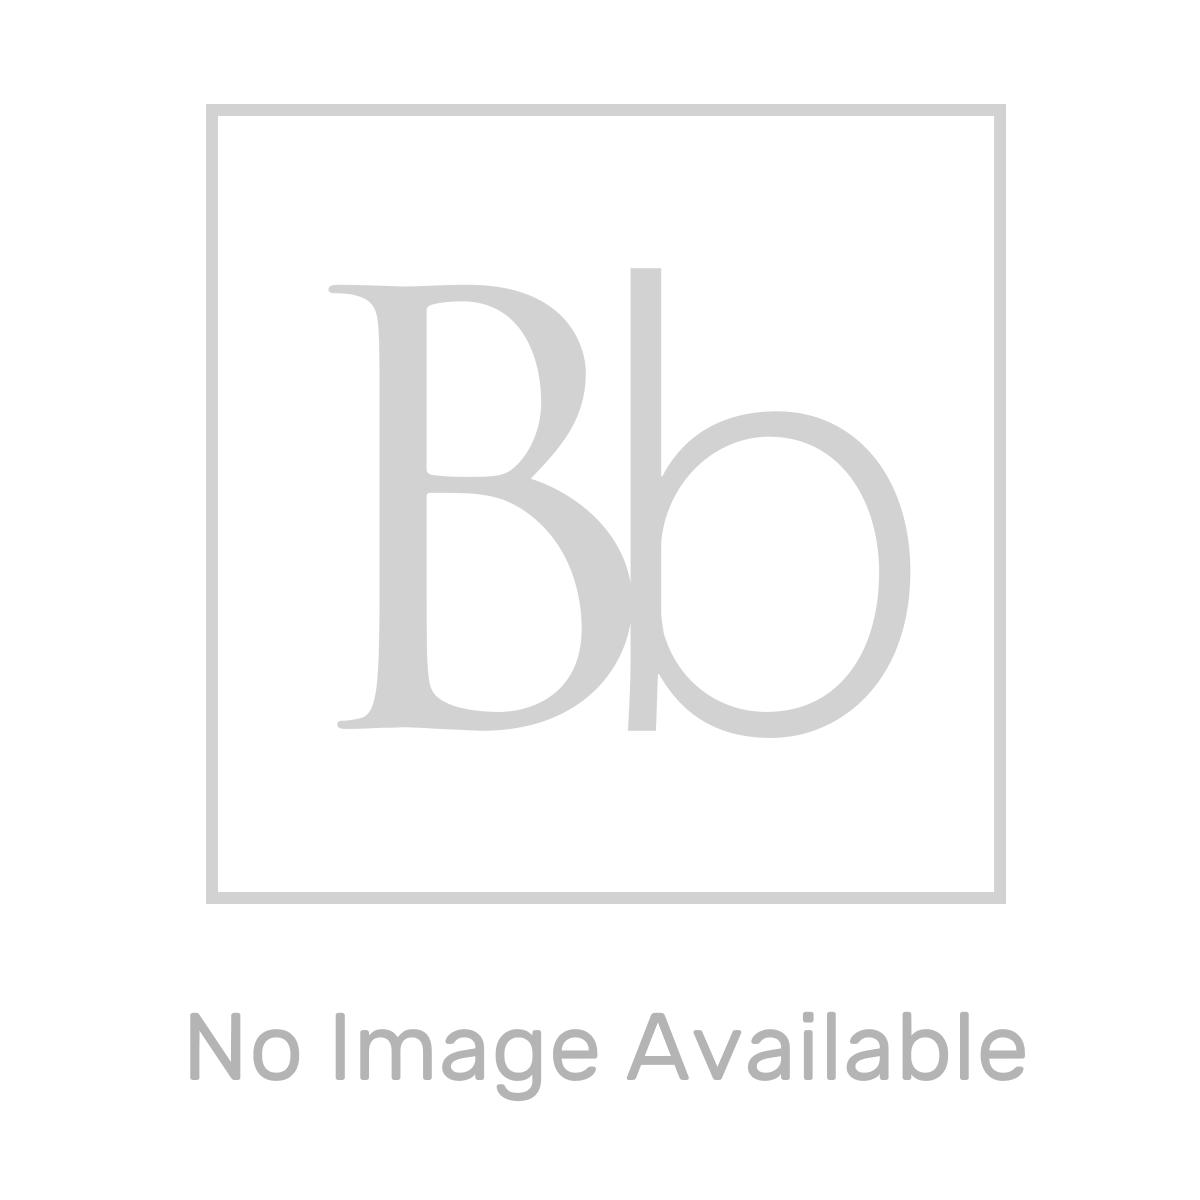 RAK Washington Grey Vanity Unit with Black Countertop 600mm Measurements